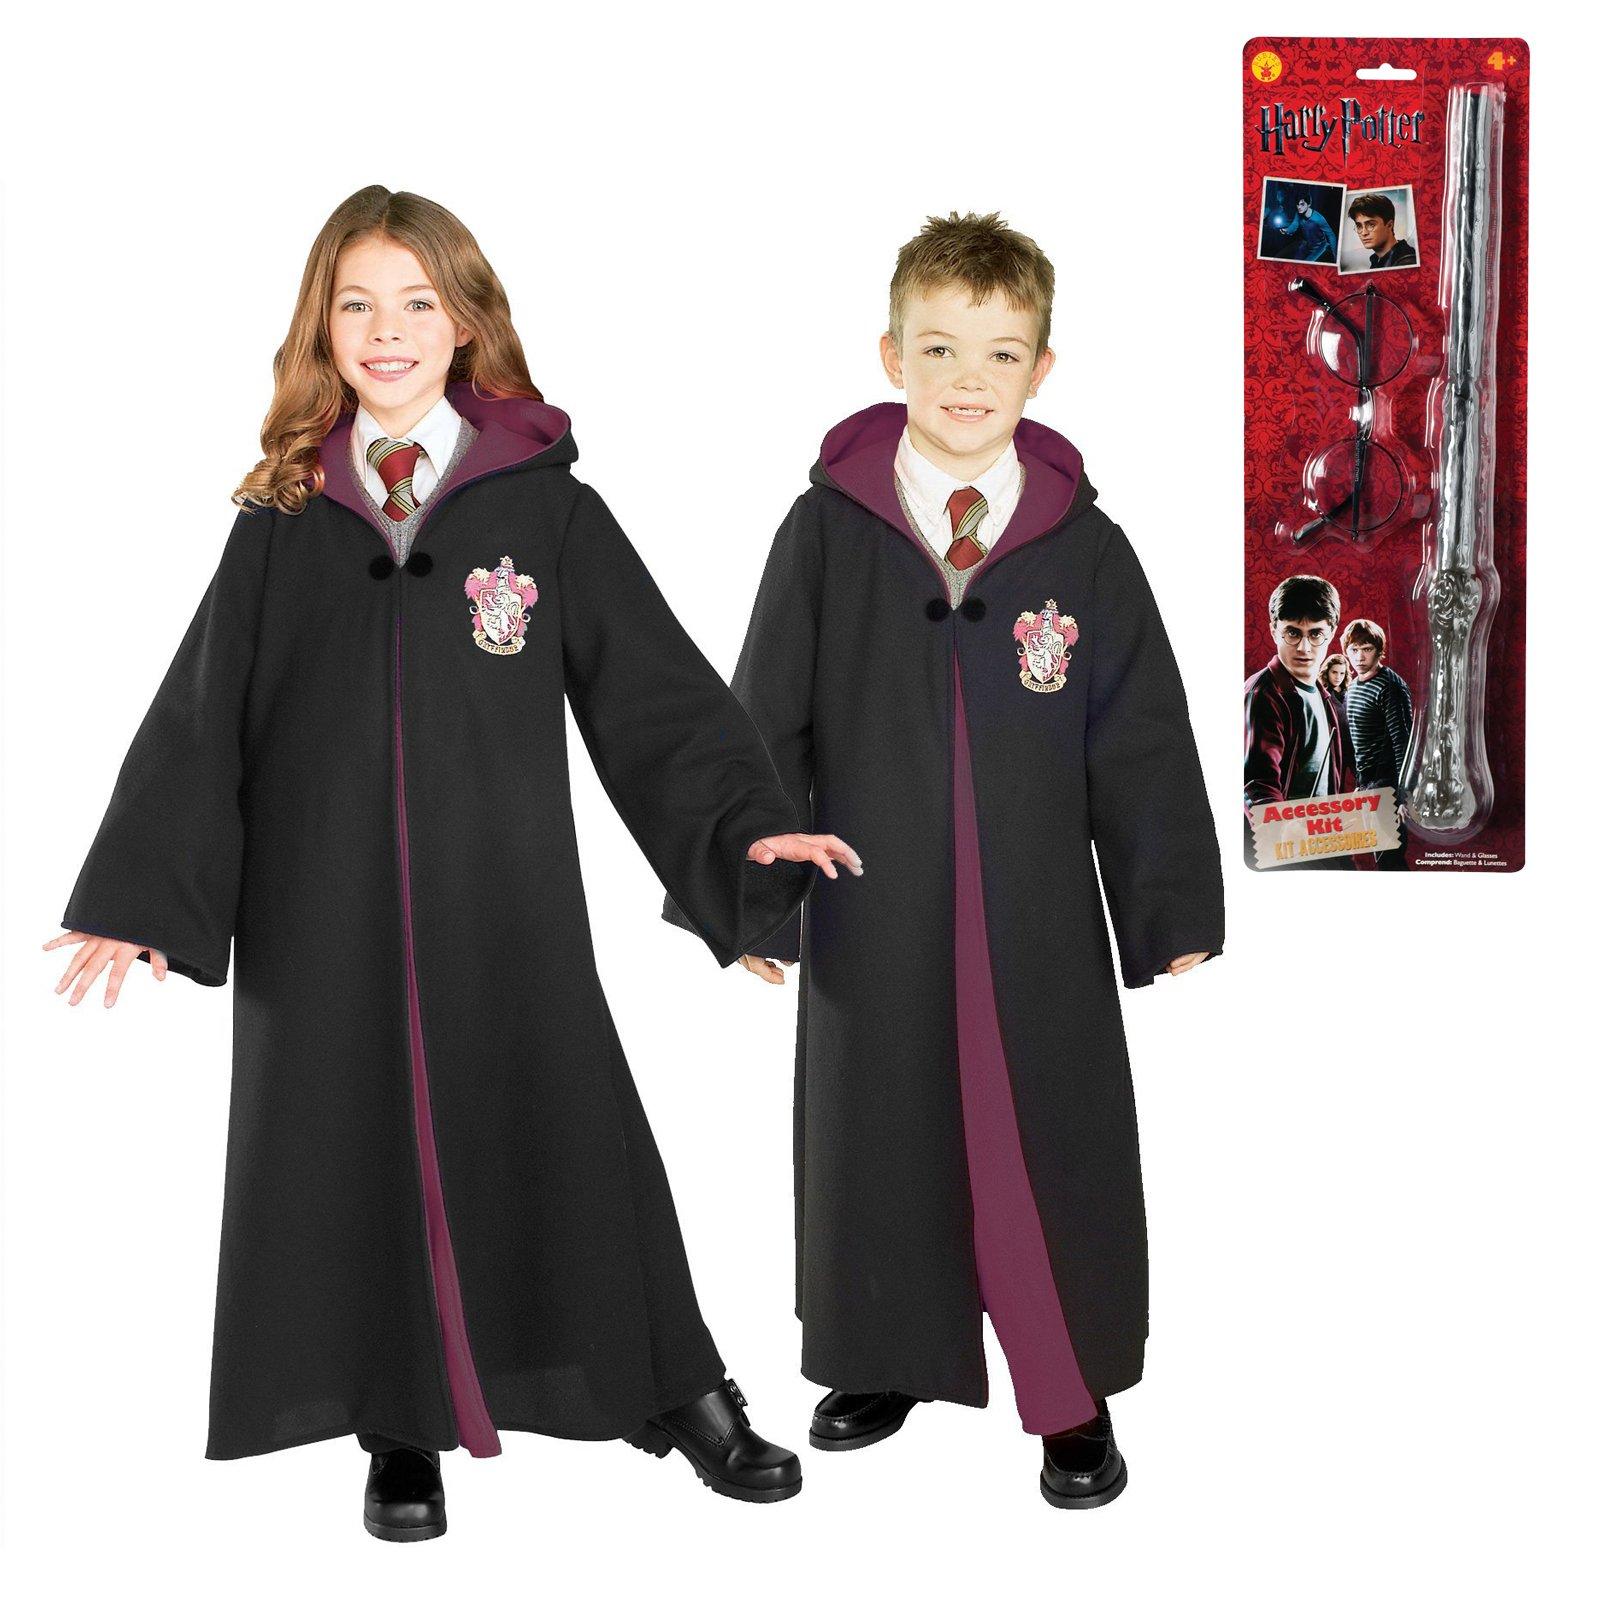 Harry Potter Gryffindor Robe Glasses and Wand Child Costume Bundle Set Medium by BirthdayExpress